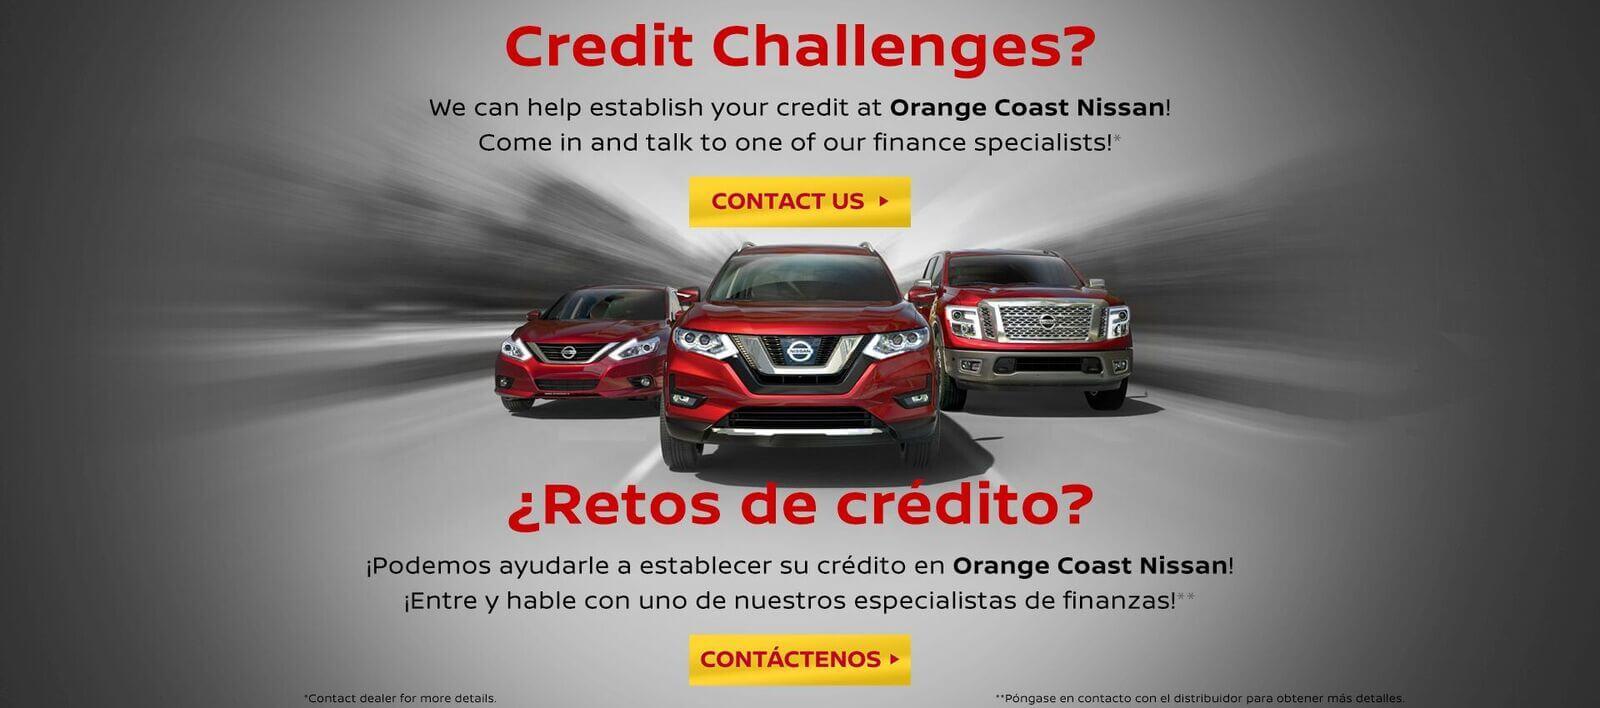 Contact US CREDIT